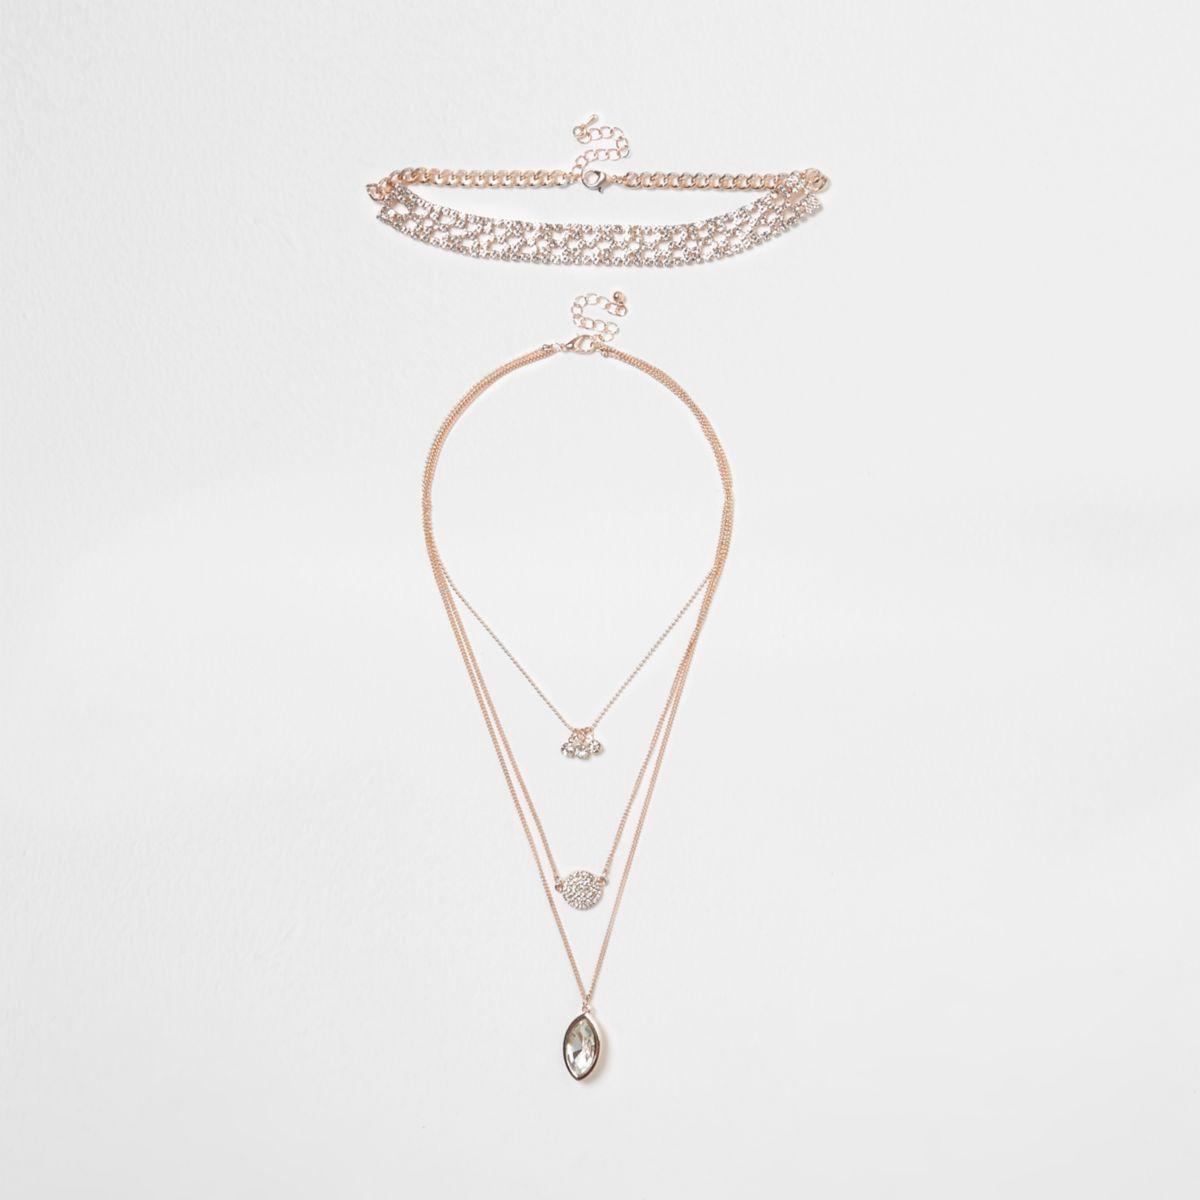 Rose gold tone diamante pave necklace set